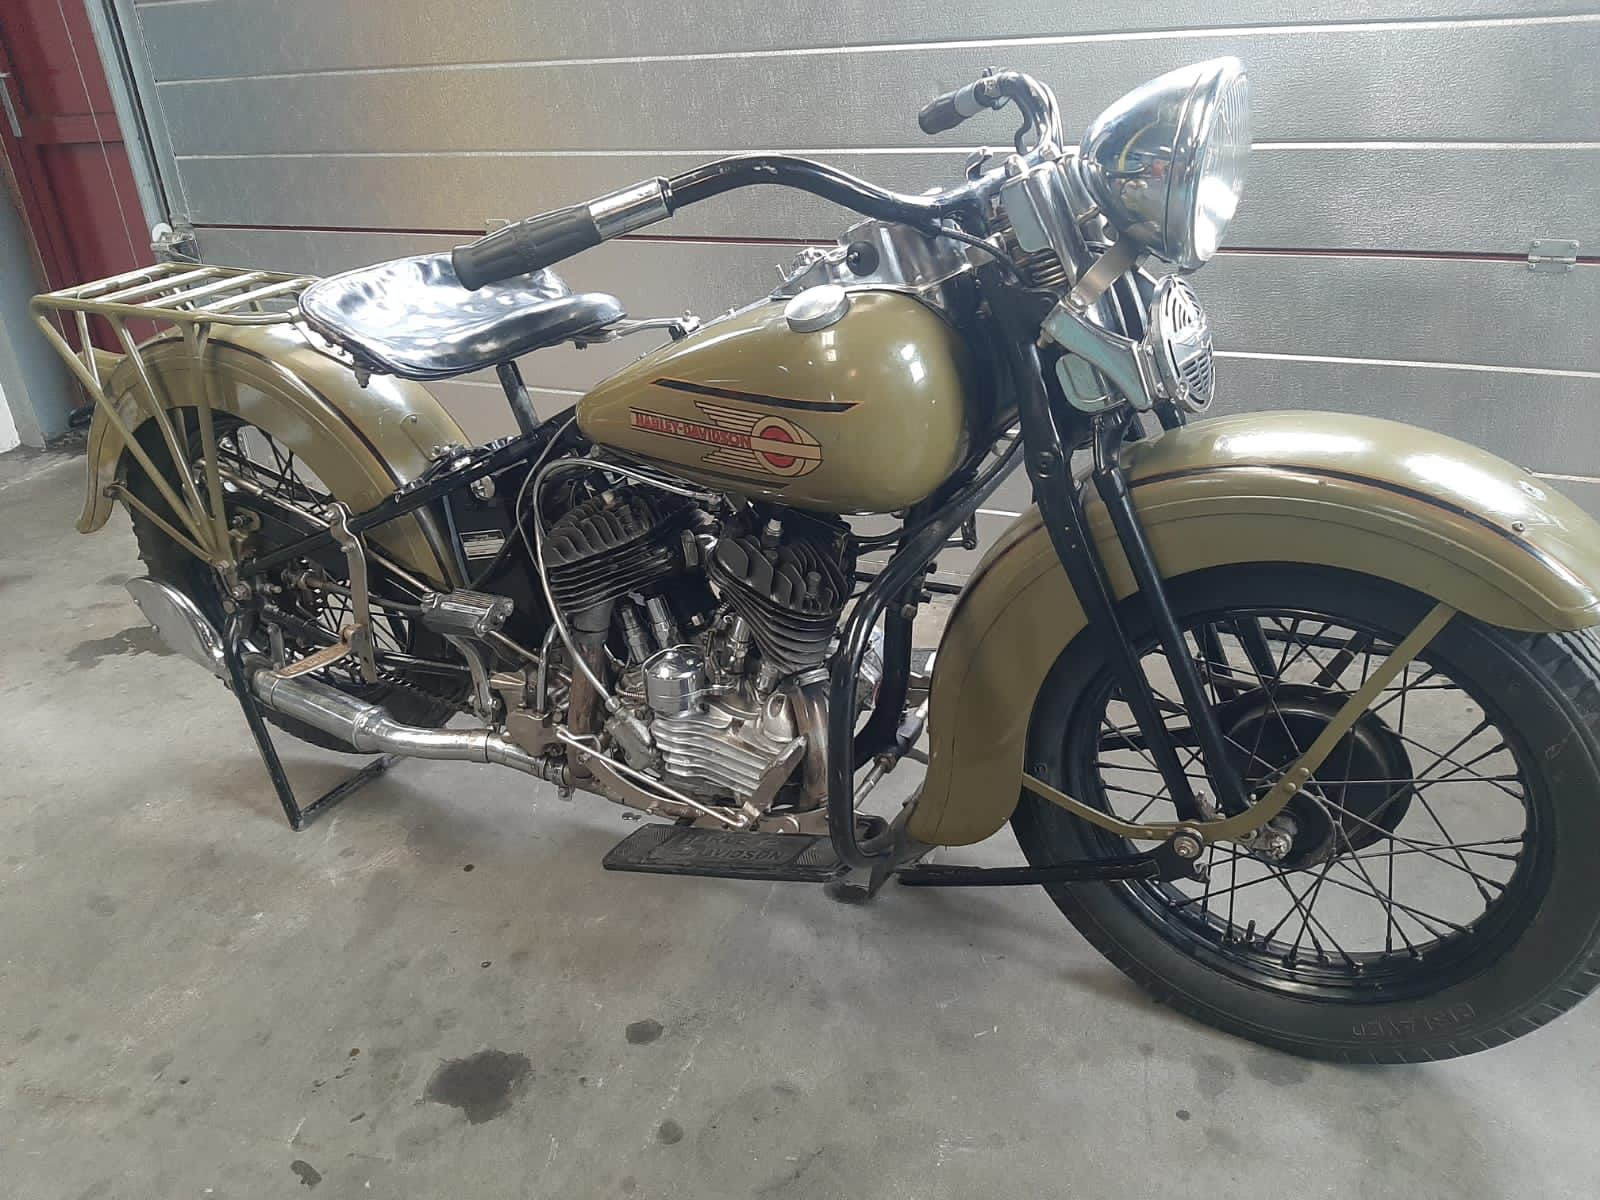 1937 Harley Davidson WL 750